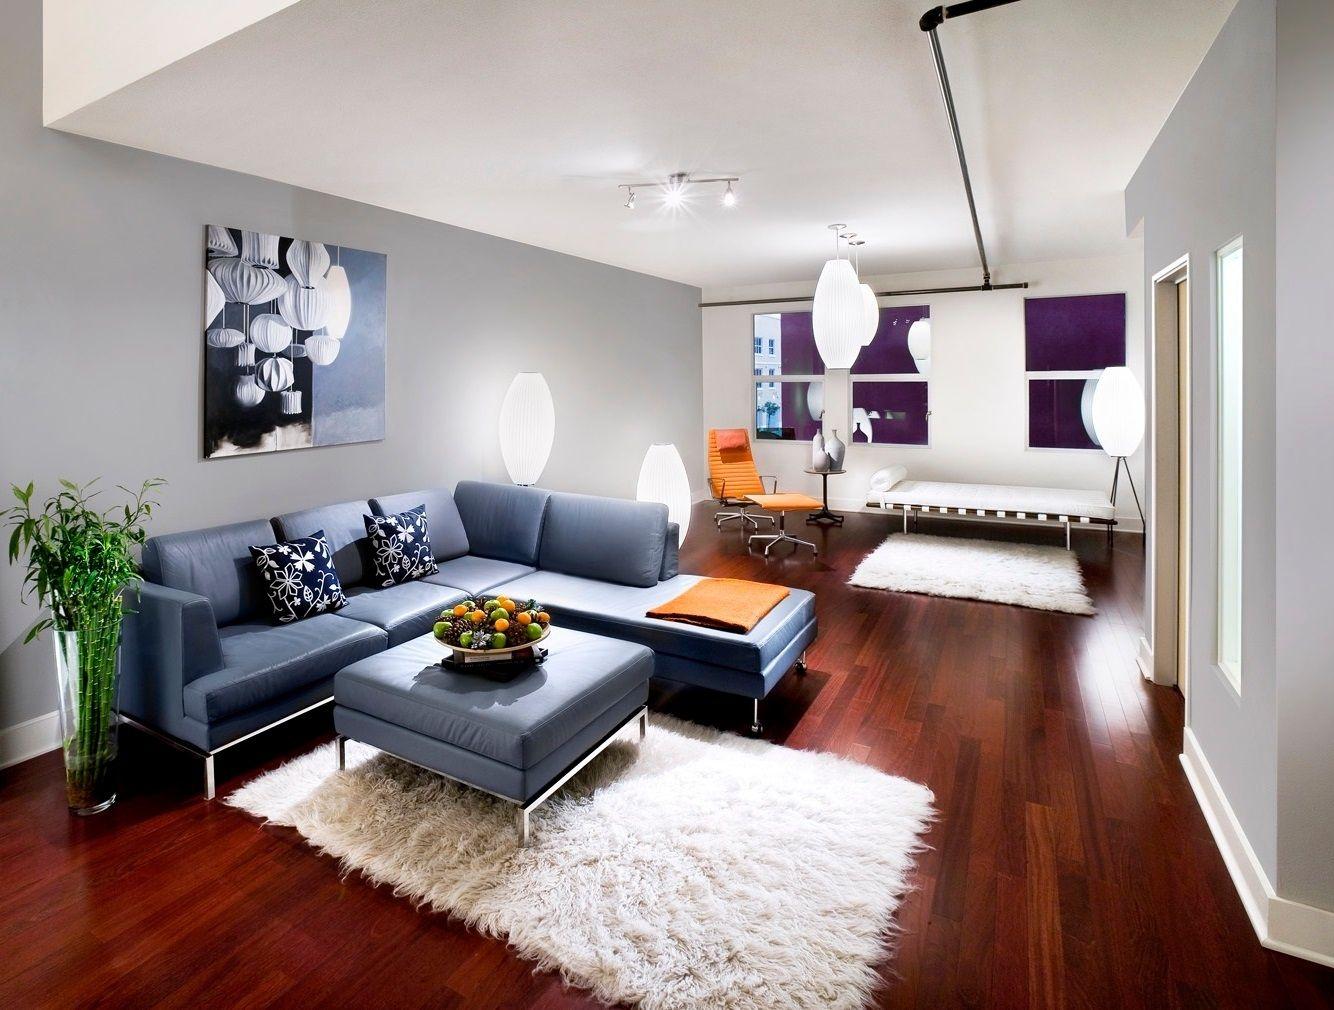 interior design orange county - 1000+ images about POJS // partment design inspiration on ...